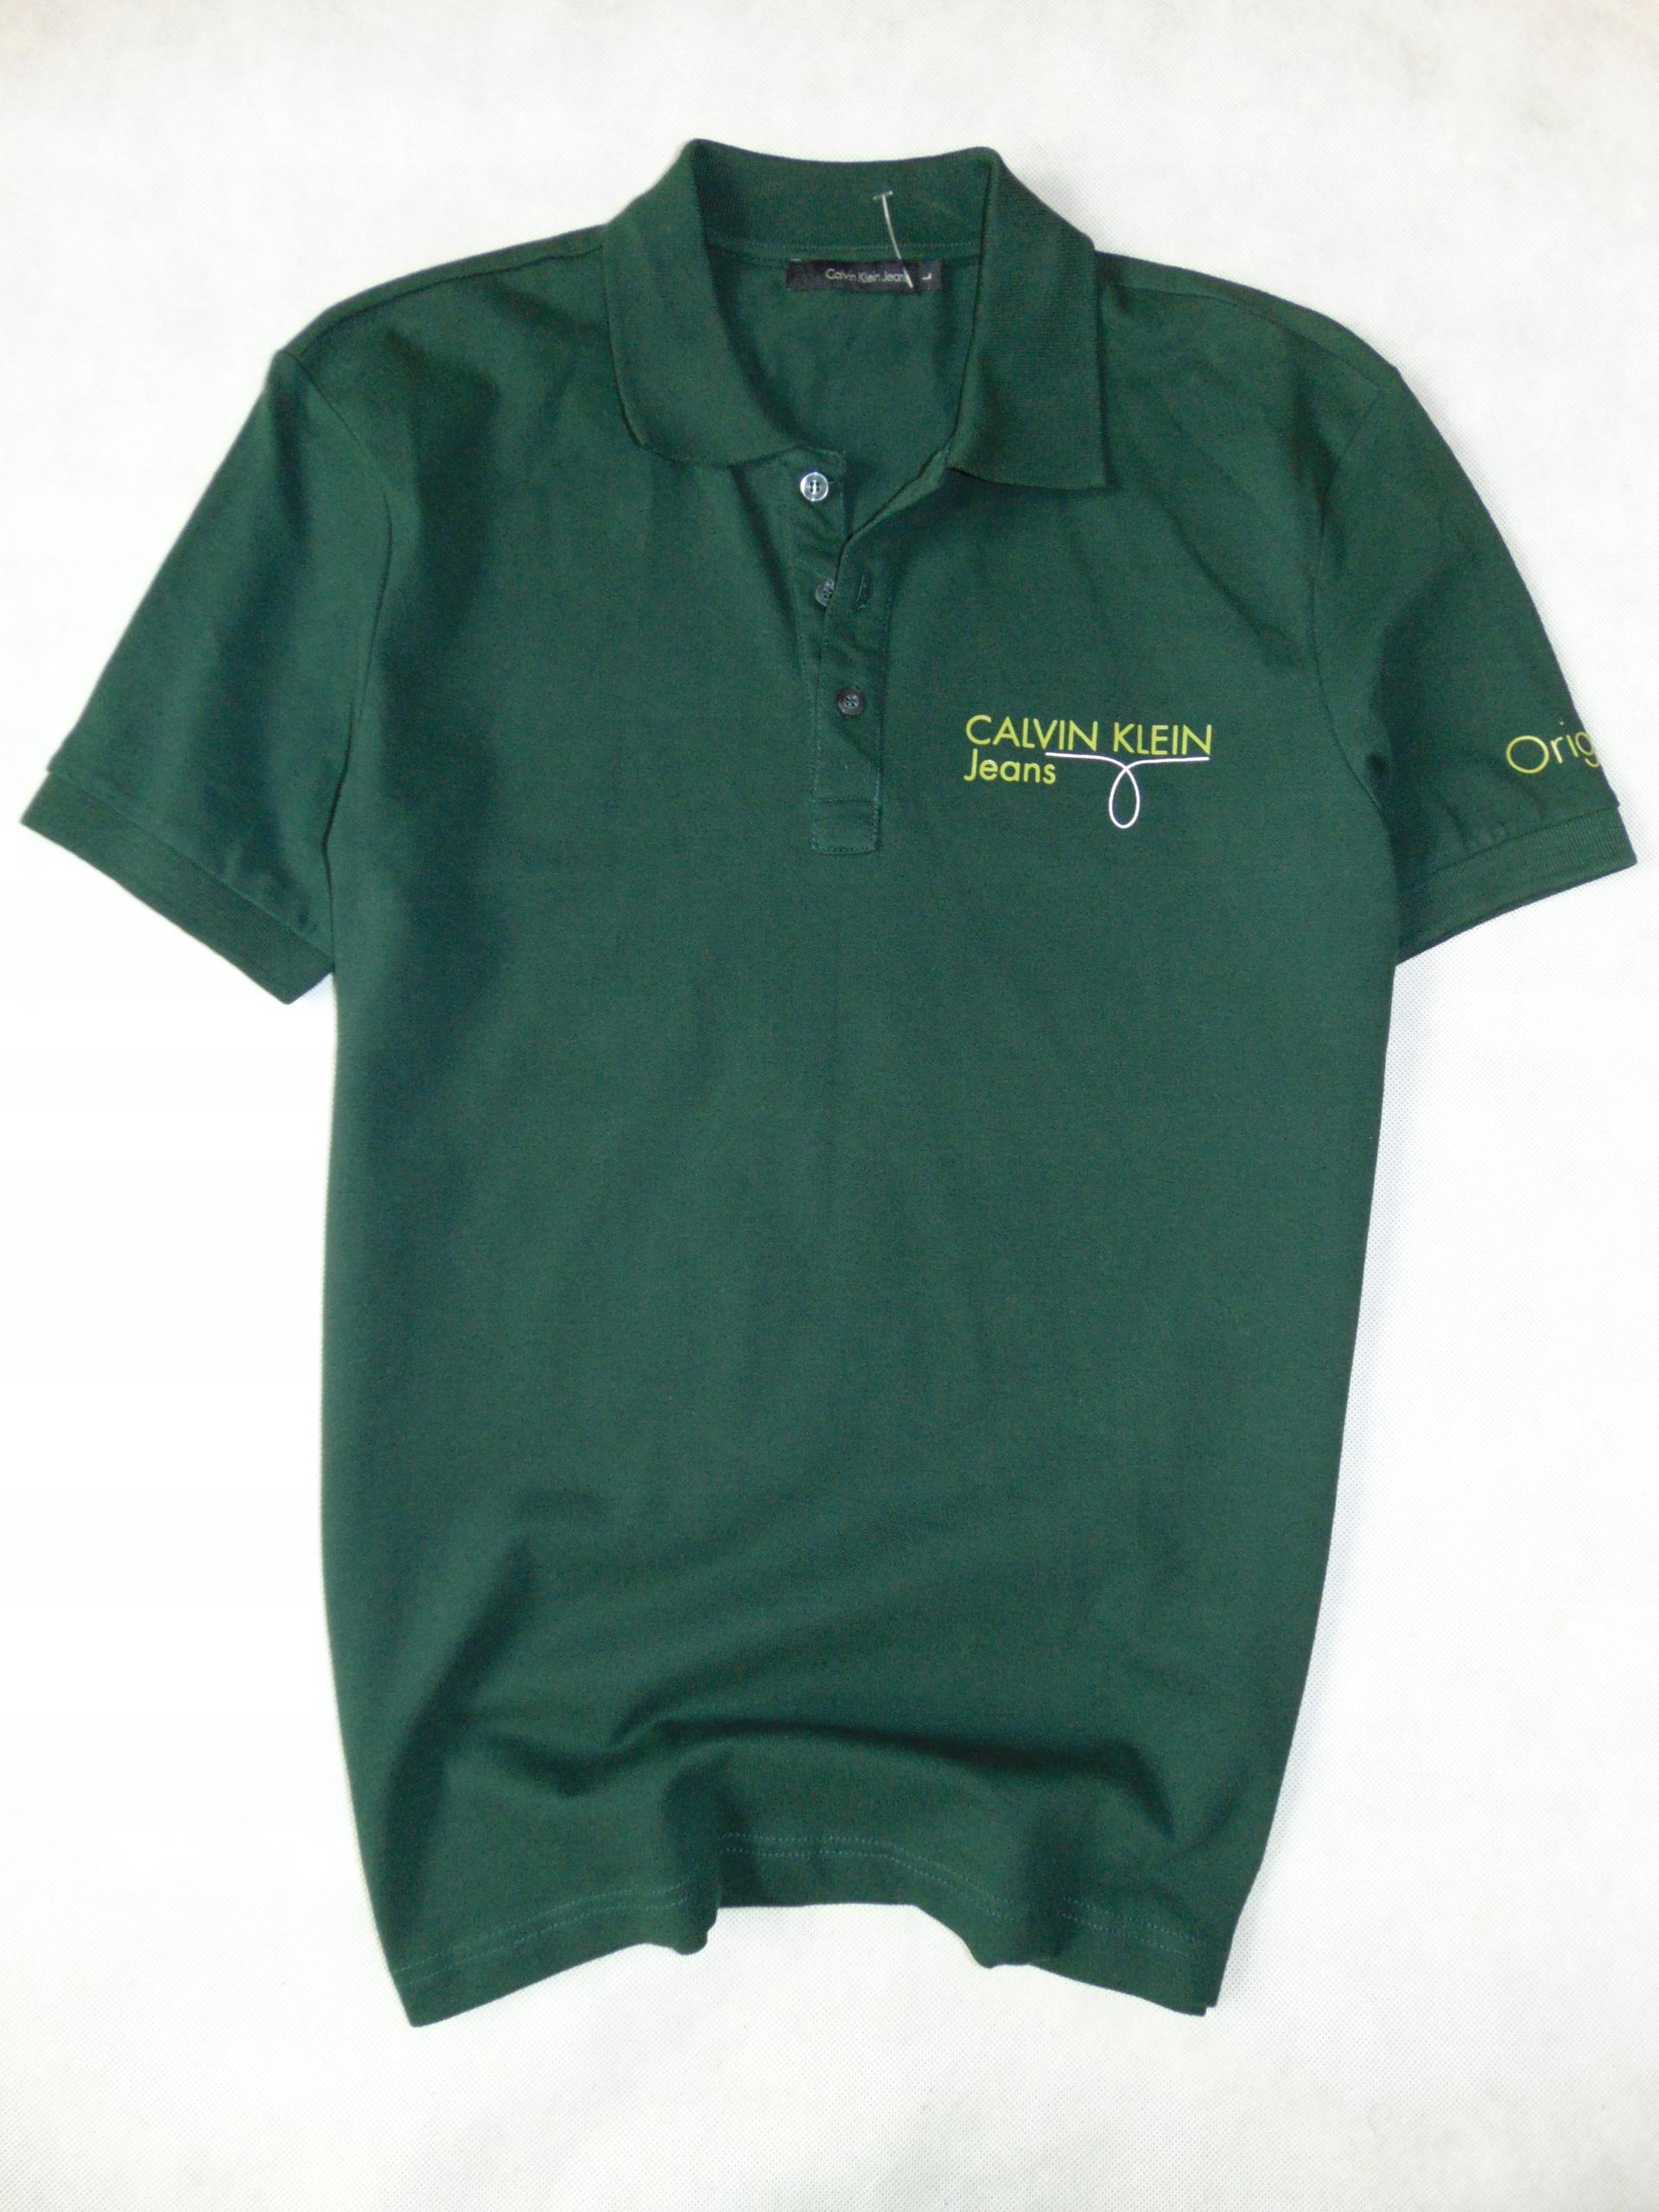 CALVIN KLEIN JEANS koszulka męska polo r L